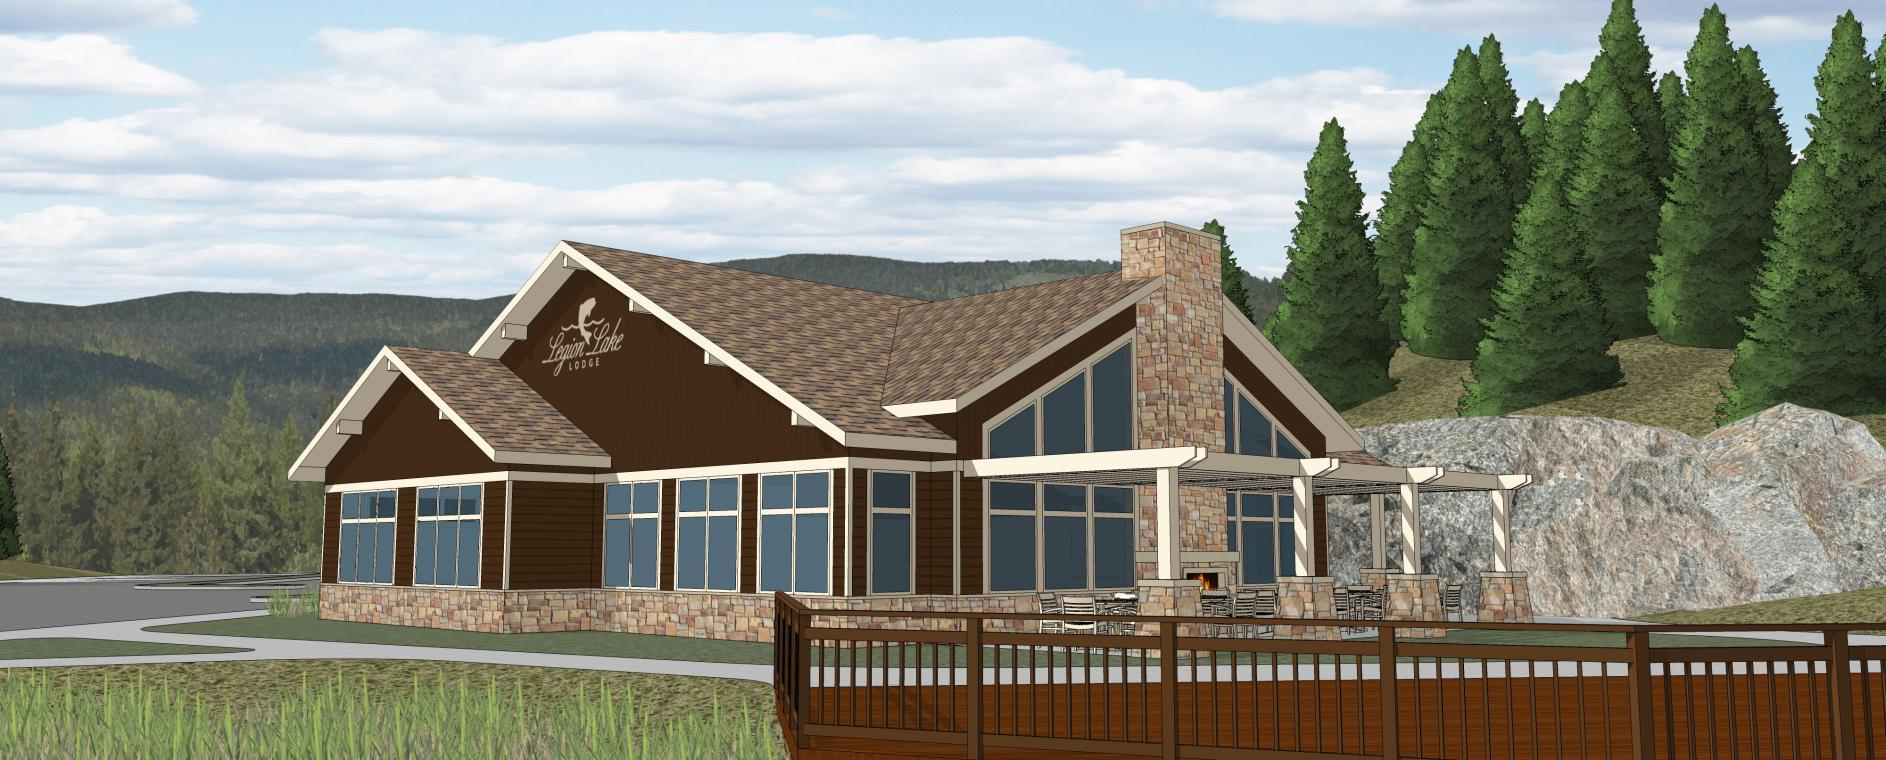 Legion Lake Lodge.